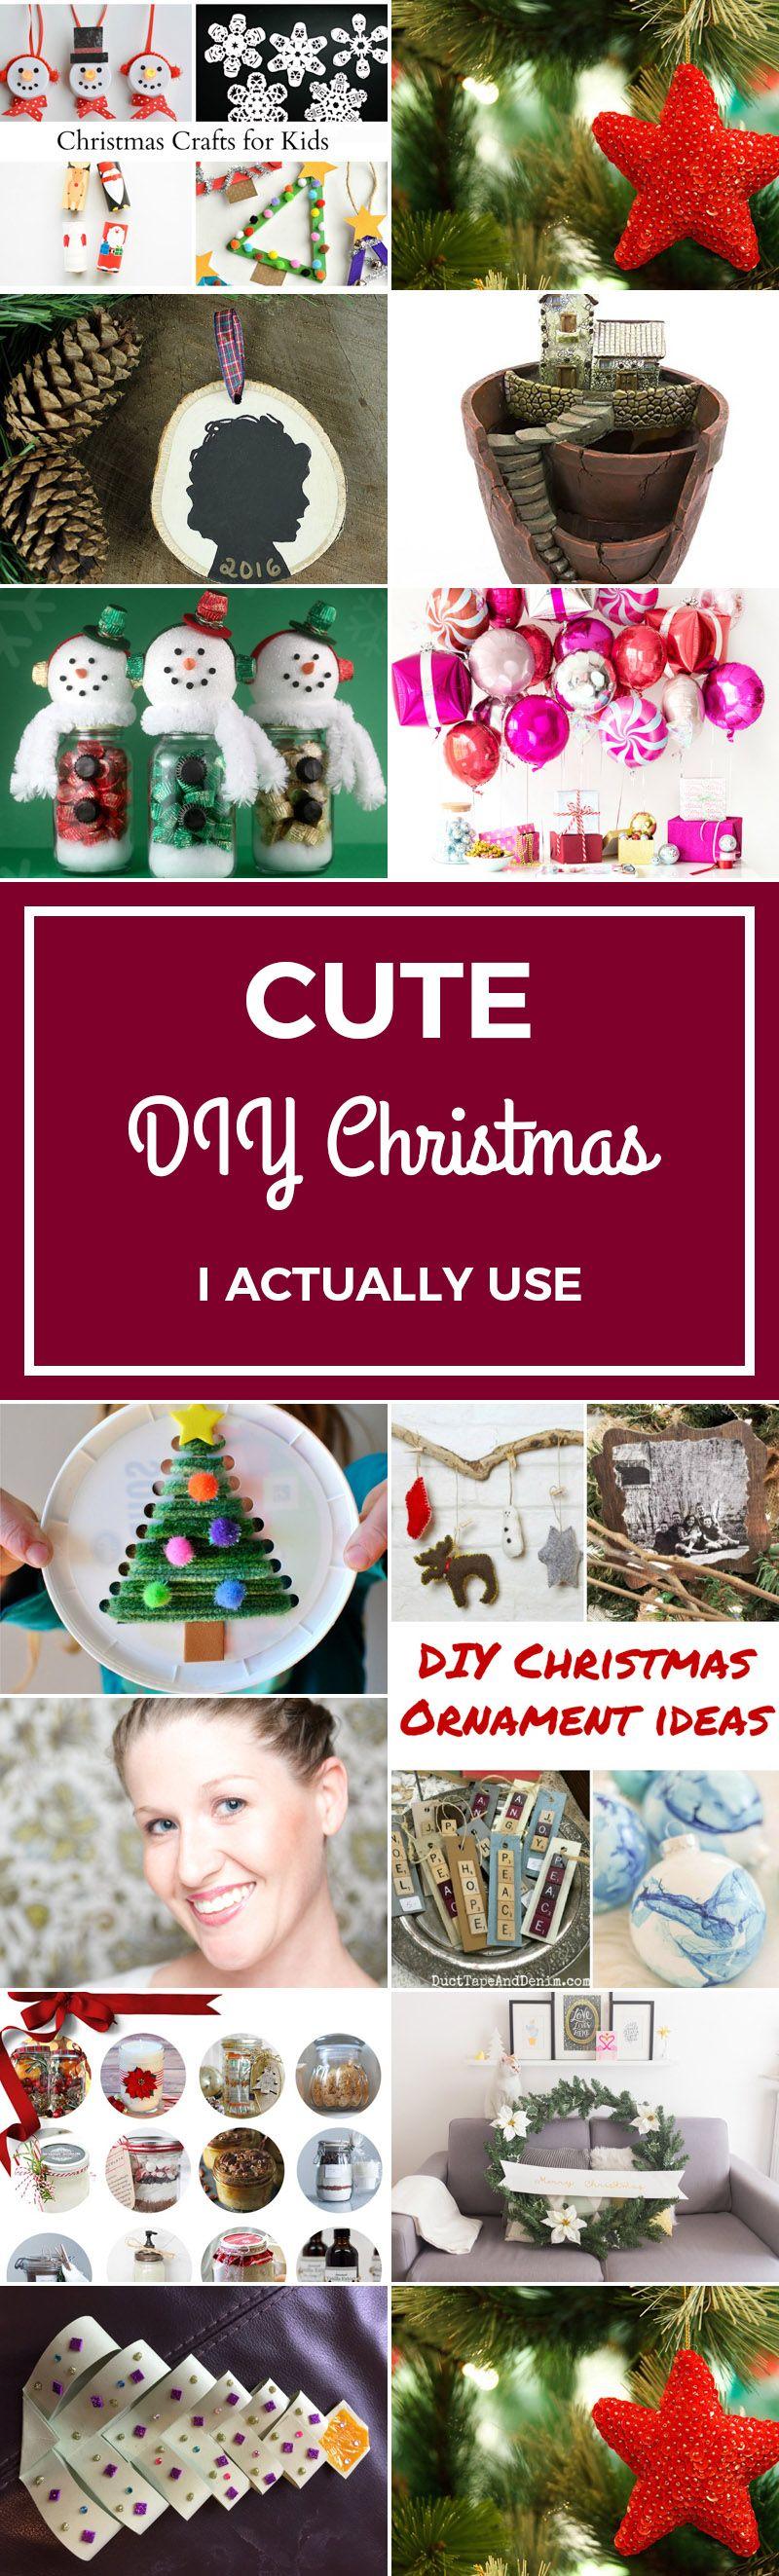 45 Cute Diy Christmas I Actually Use